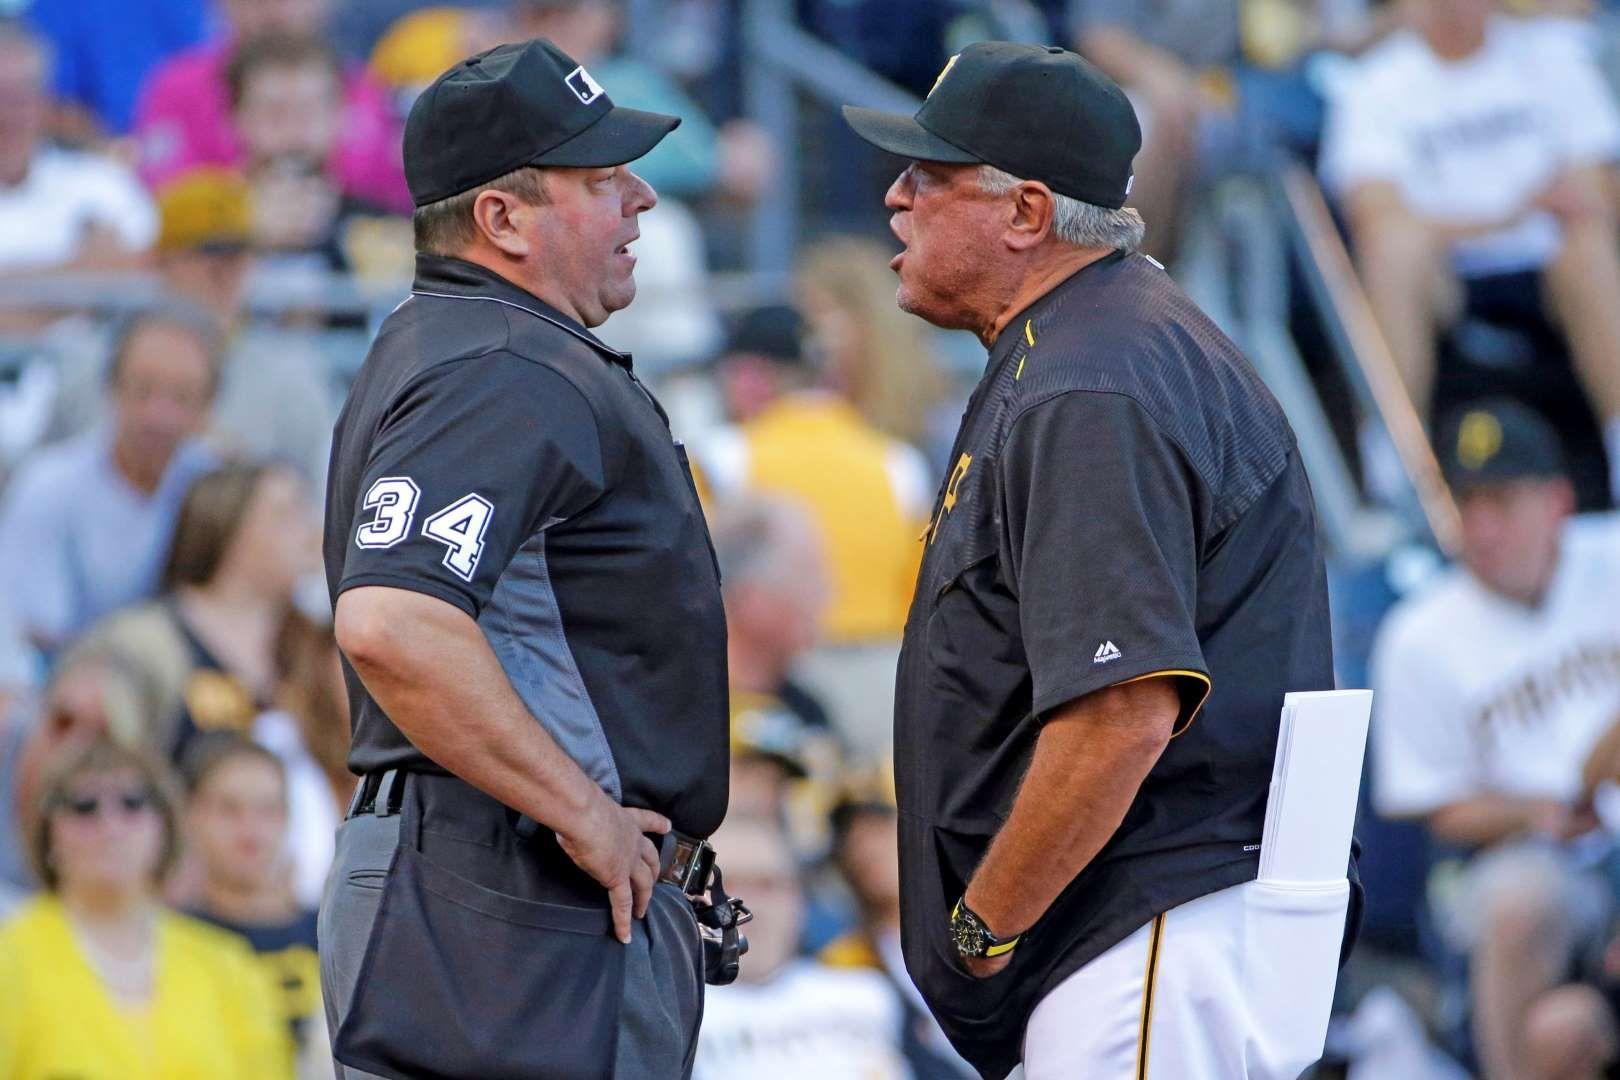 2016 MLB season Mlb, Major league baseball, Pittsburgh pride